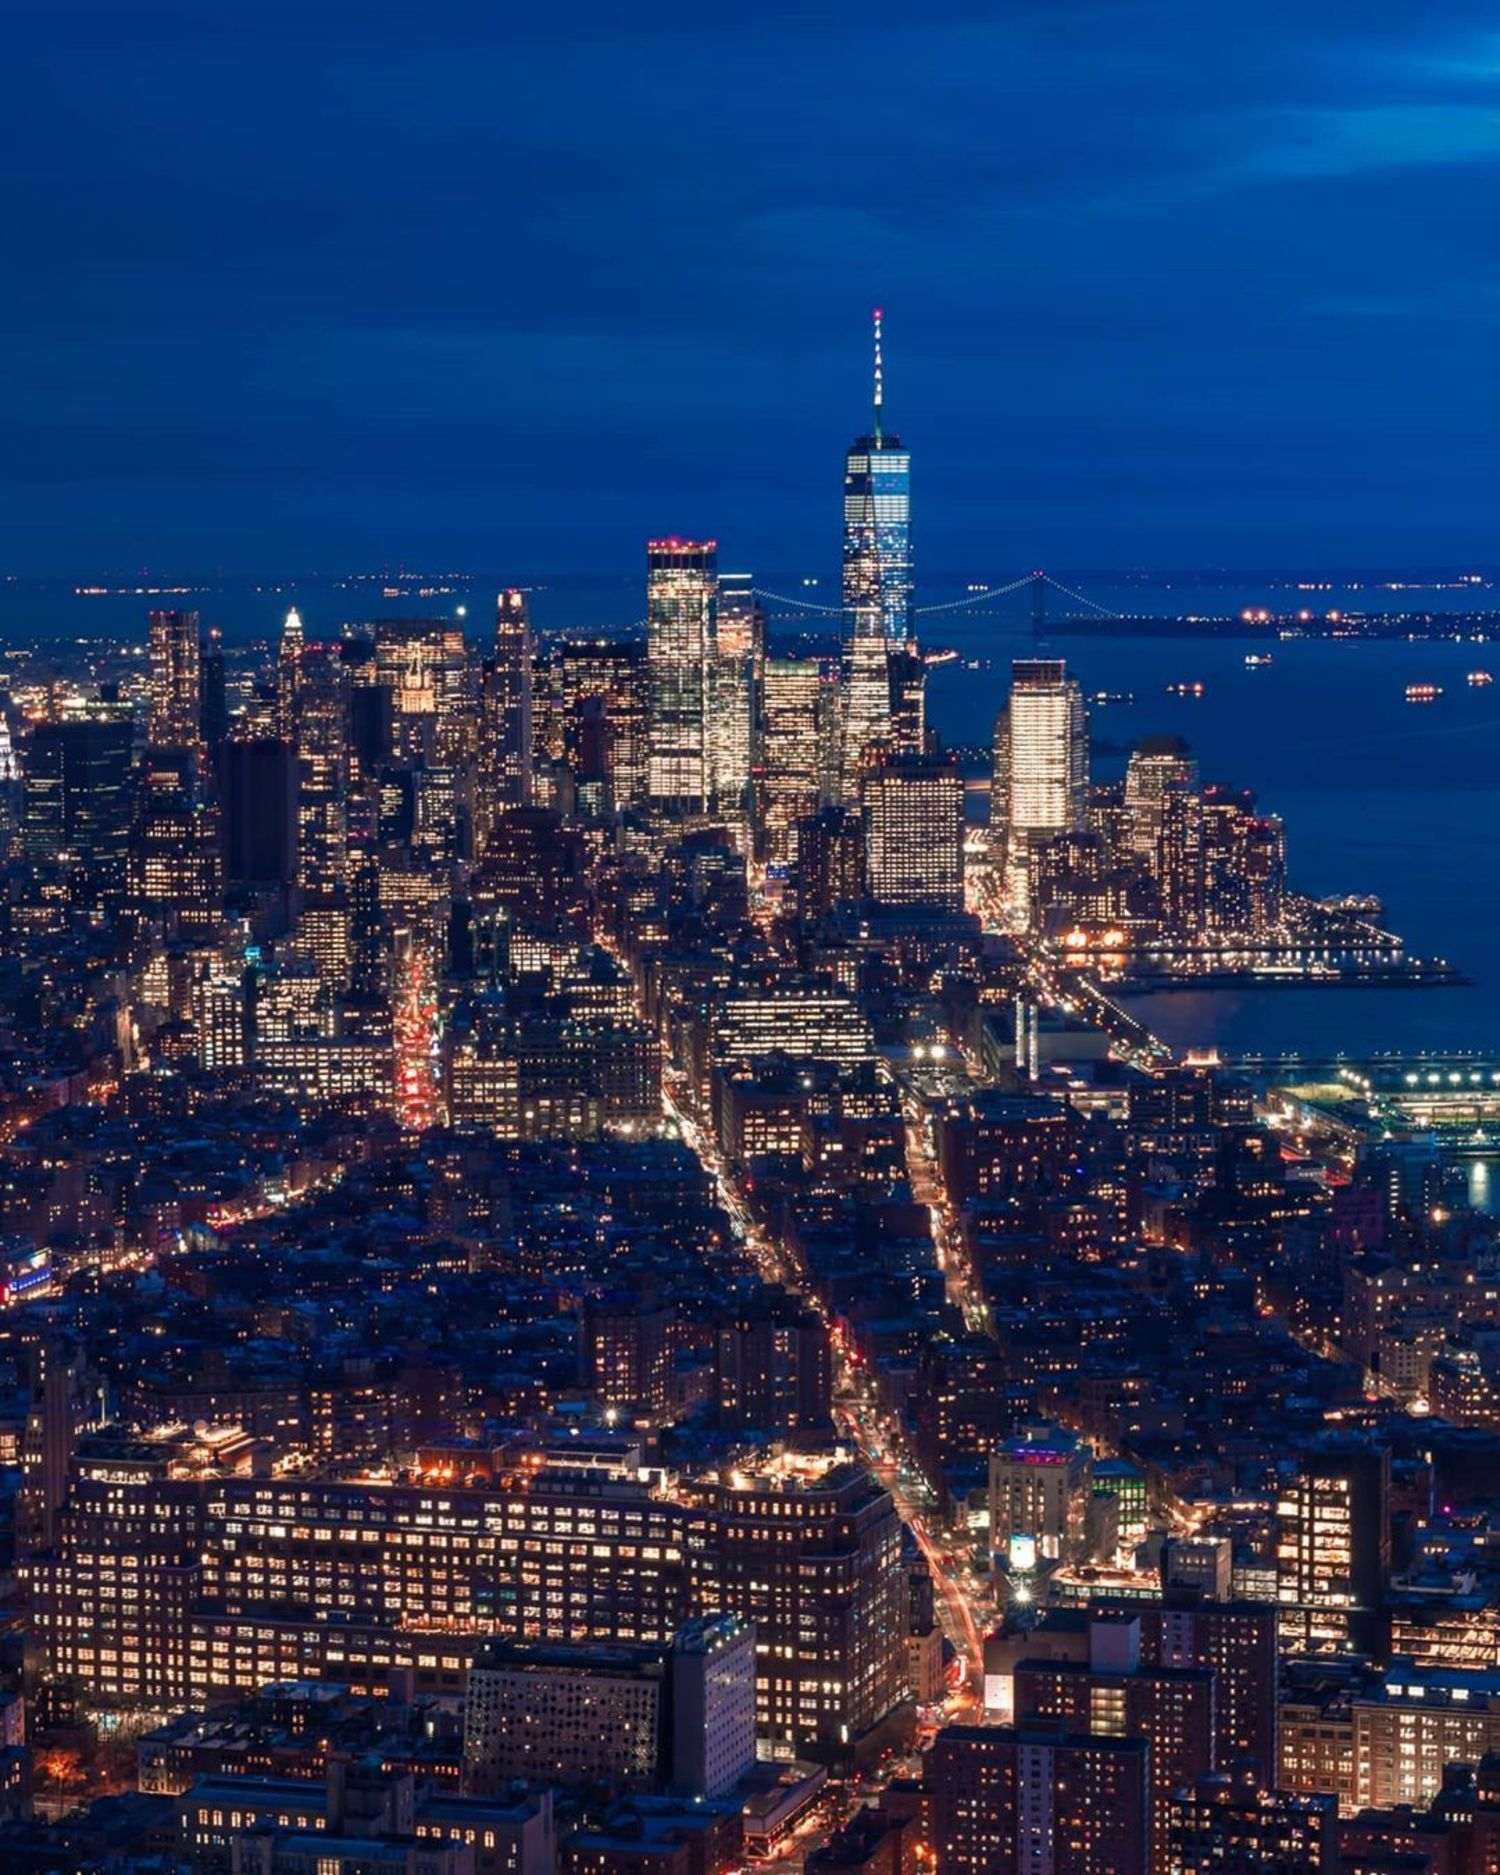 Lower Manhattan from The Edge, Hudson Yards, Manhattan